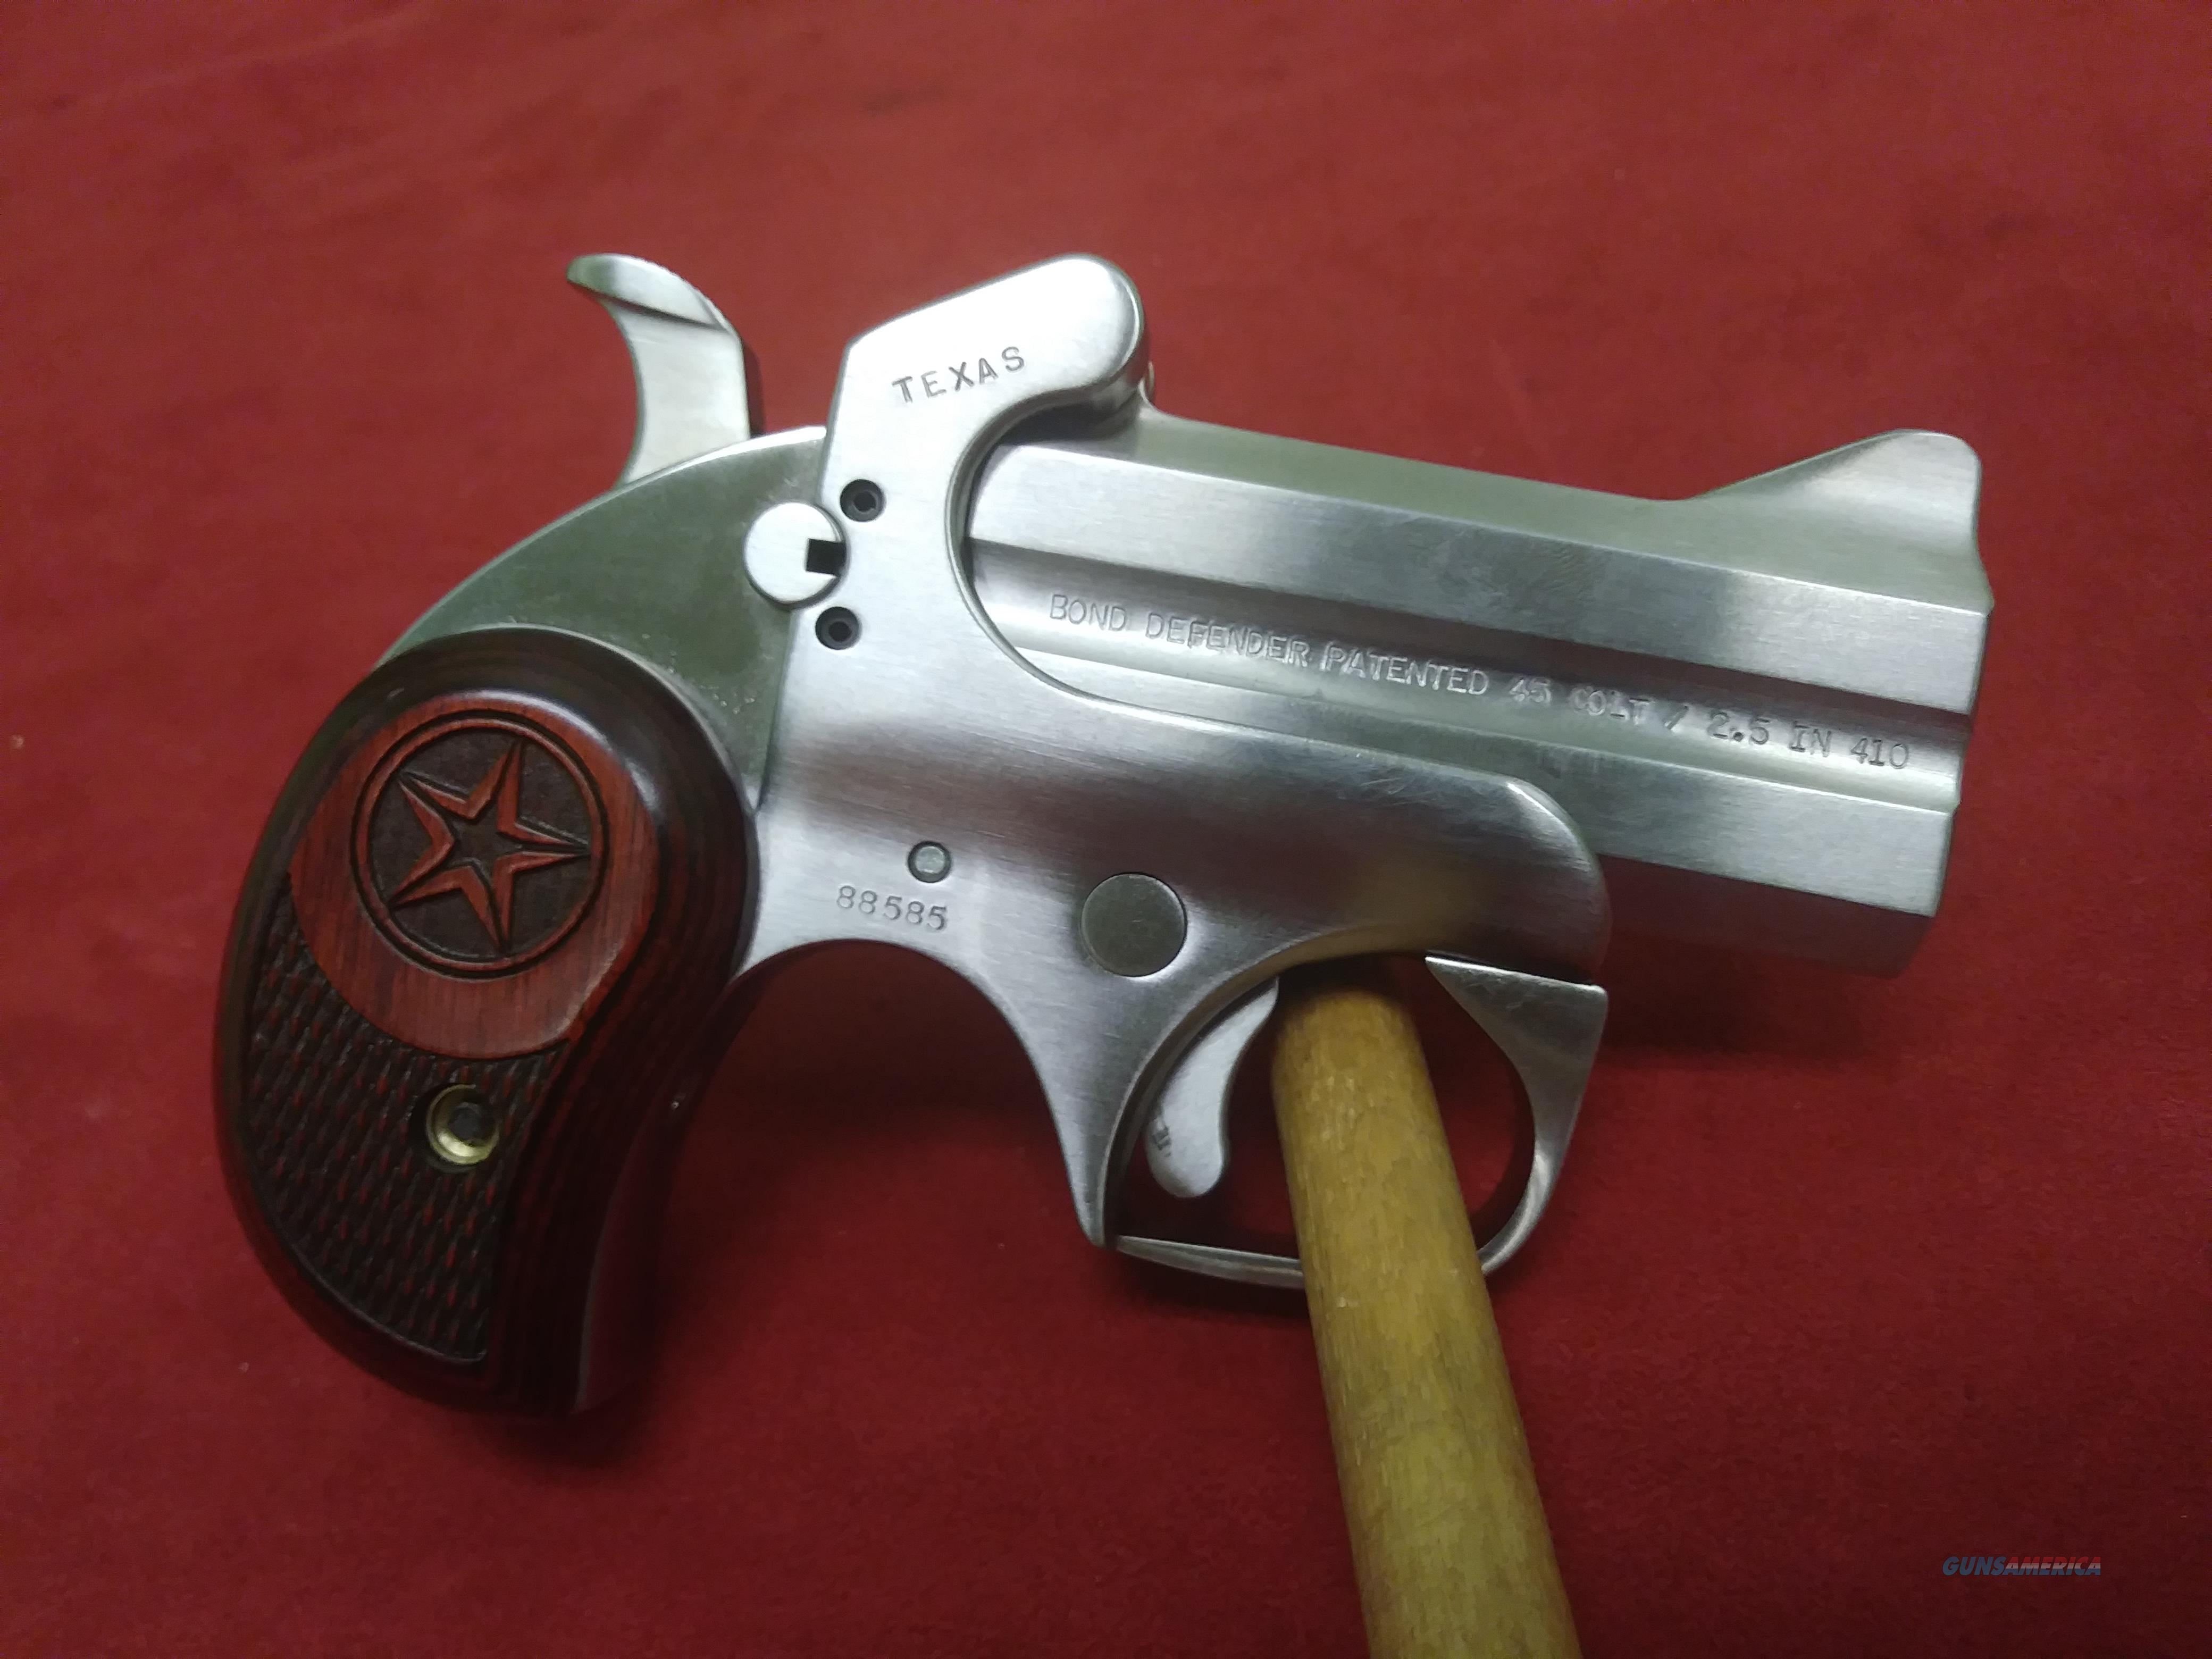 Bond Arms Defender, .45 Long Colt/.410 ga  Guns > Pistols > Bond Derringers